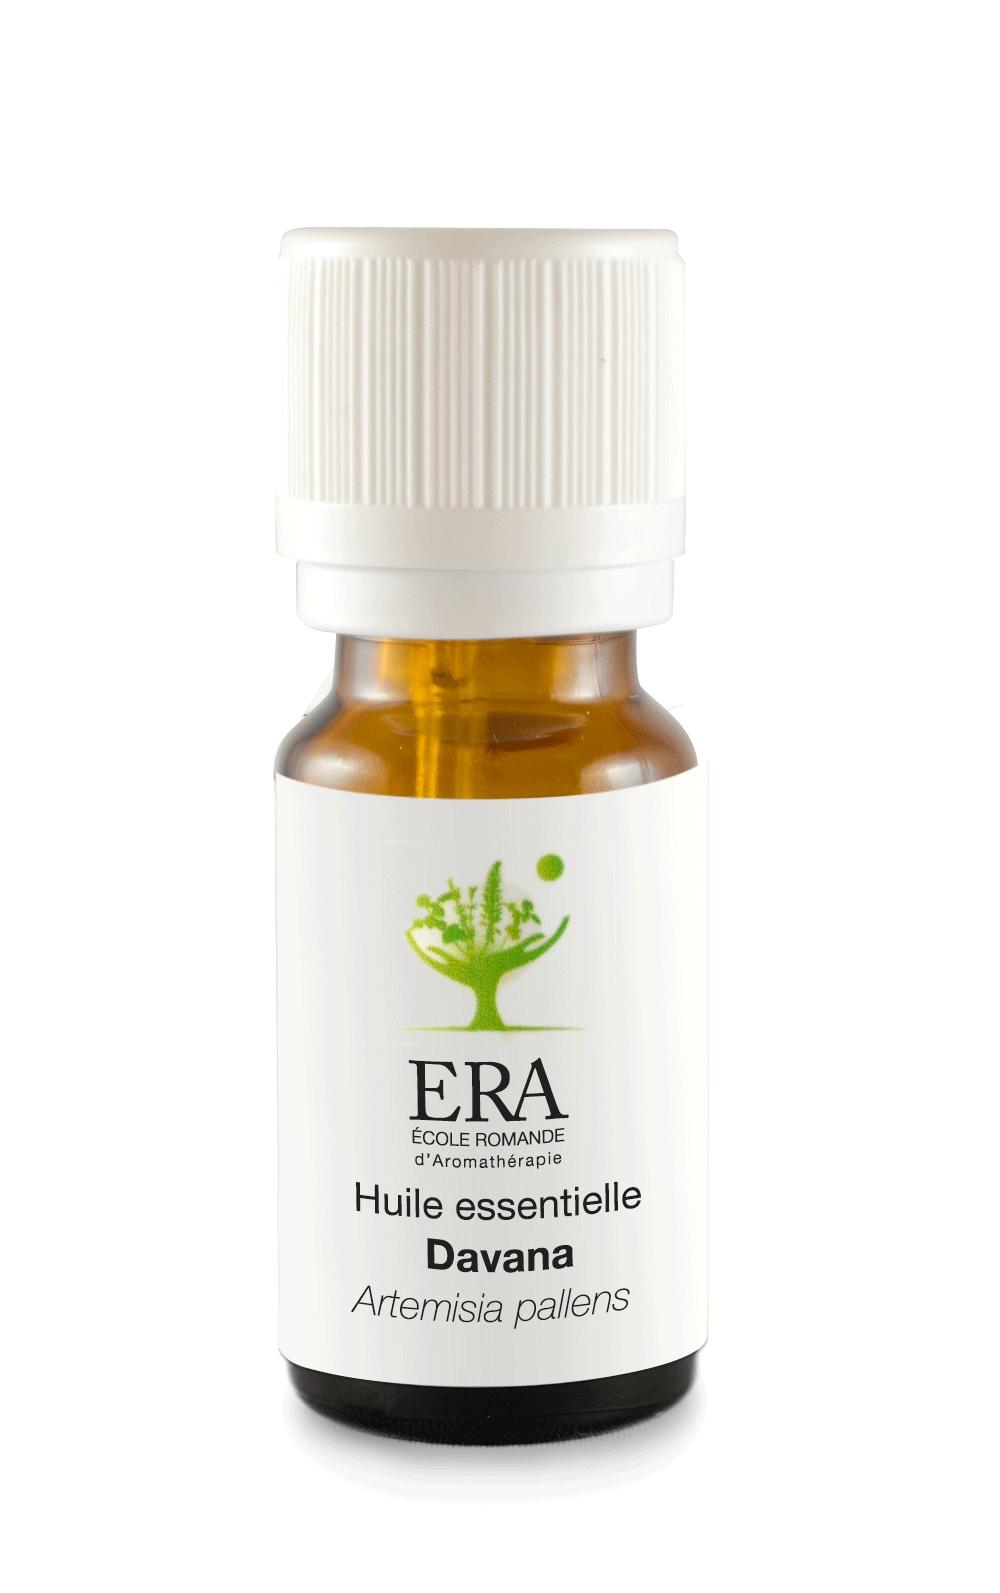 Davana - Artemisia pallens - Astéracées